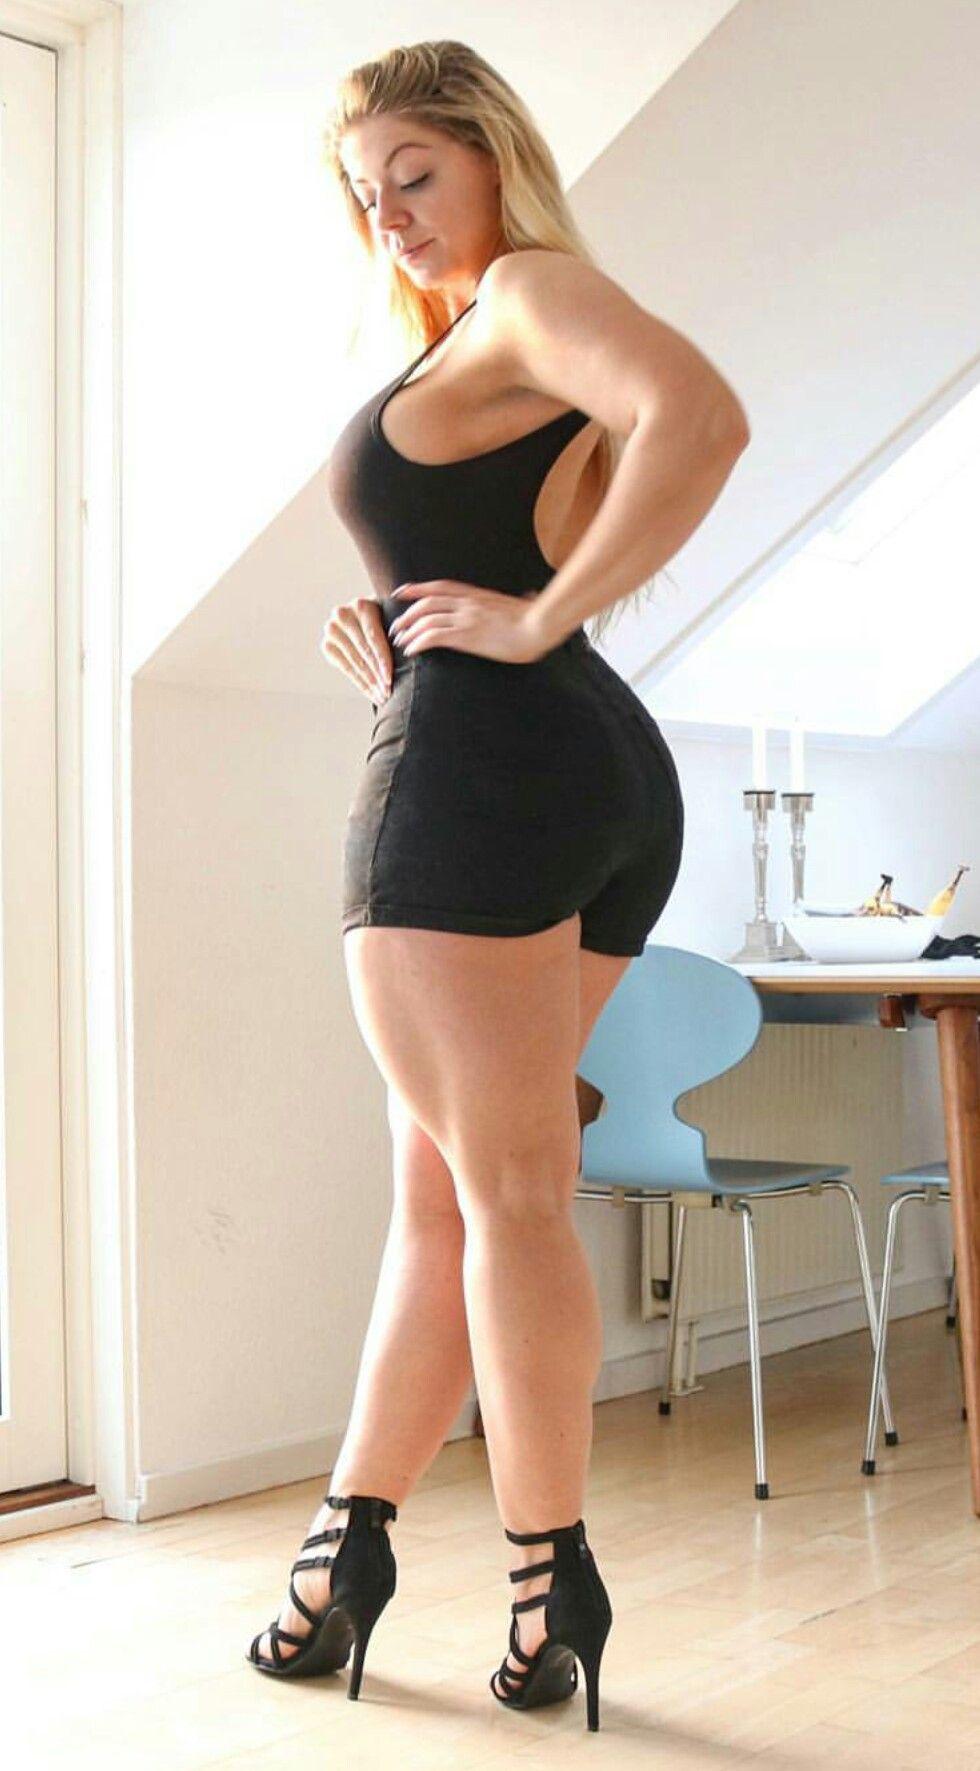 Mia Sand #MissMiaFit #blonde #curves #Beautiful # ...